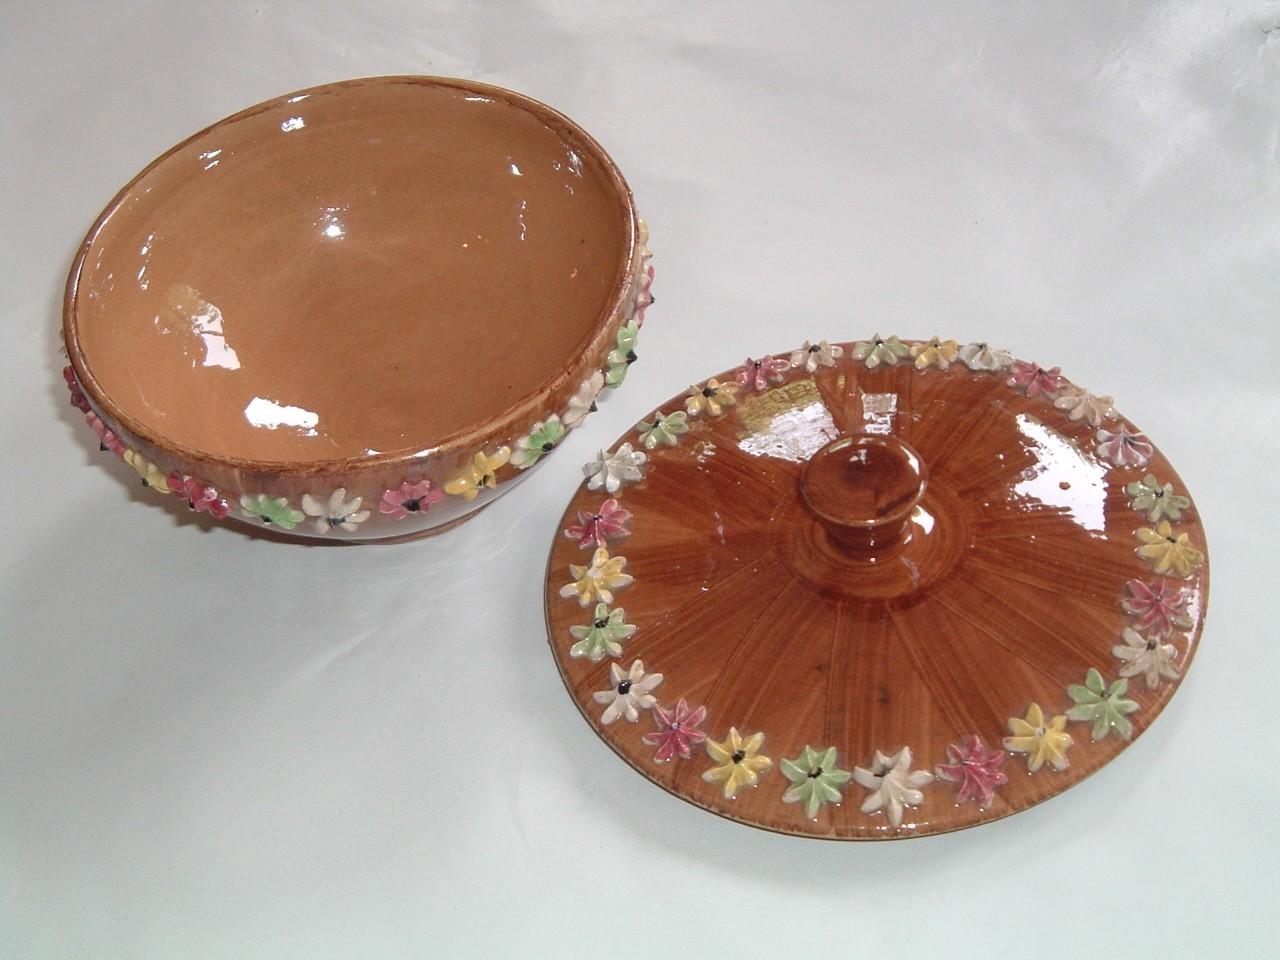 Vintage Ornate Lidded Pottery Bowl